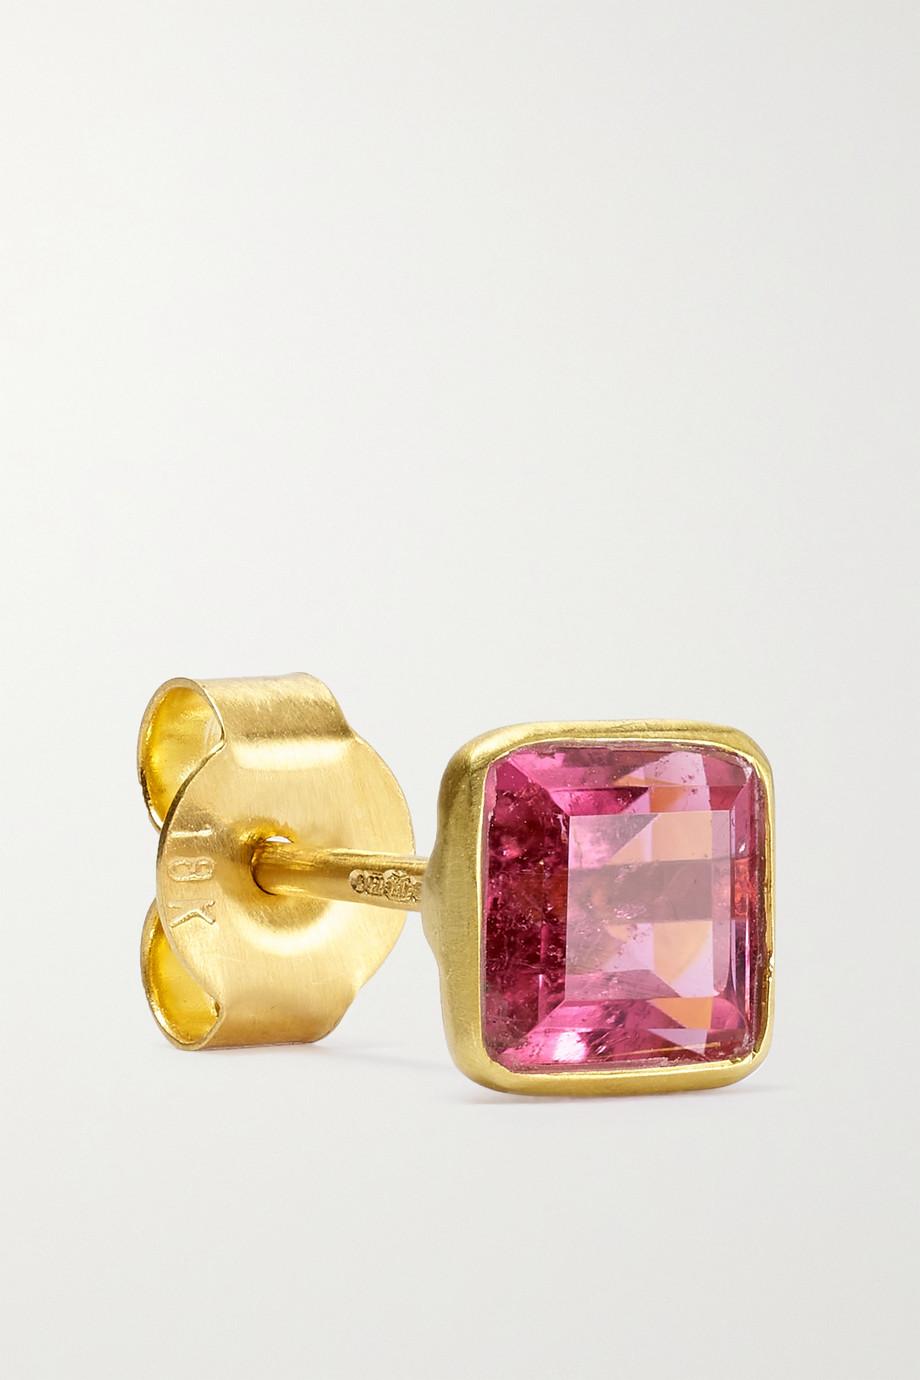 Pippa Small Ohrstecker aus 18 Karat Gold mit Turmalinen